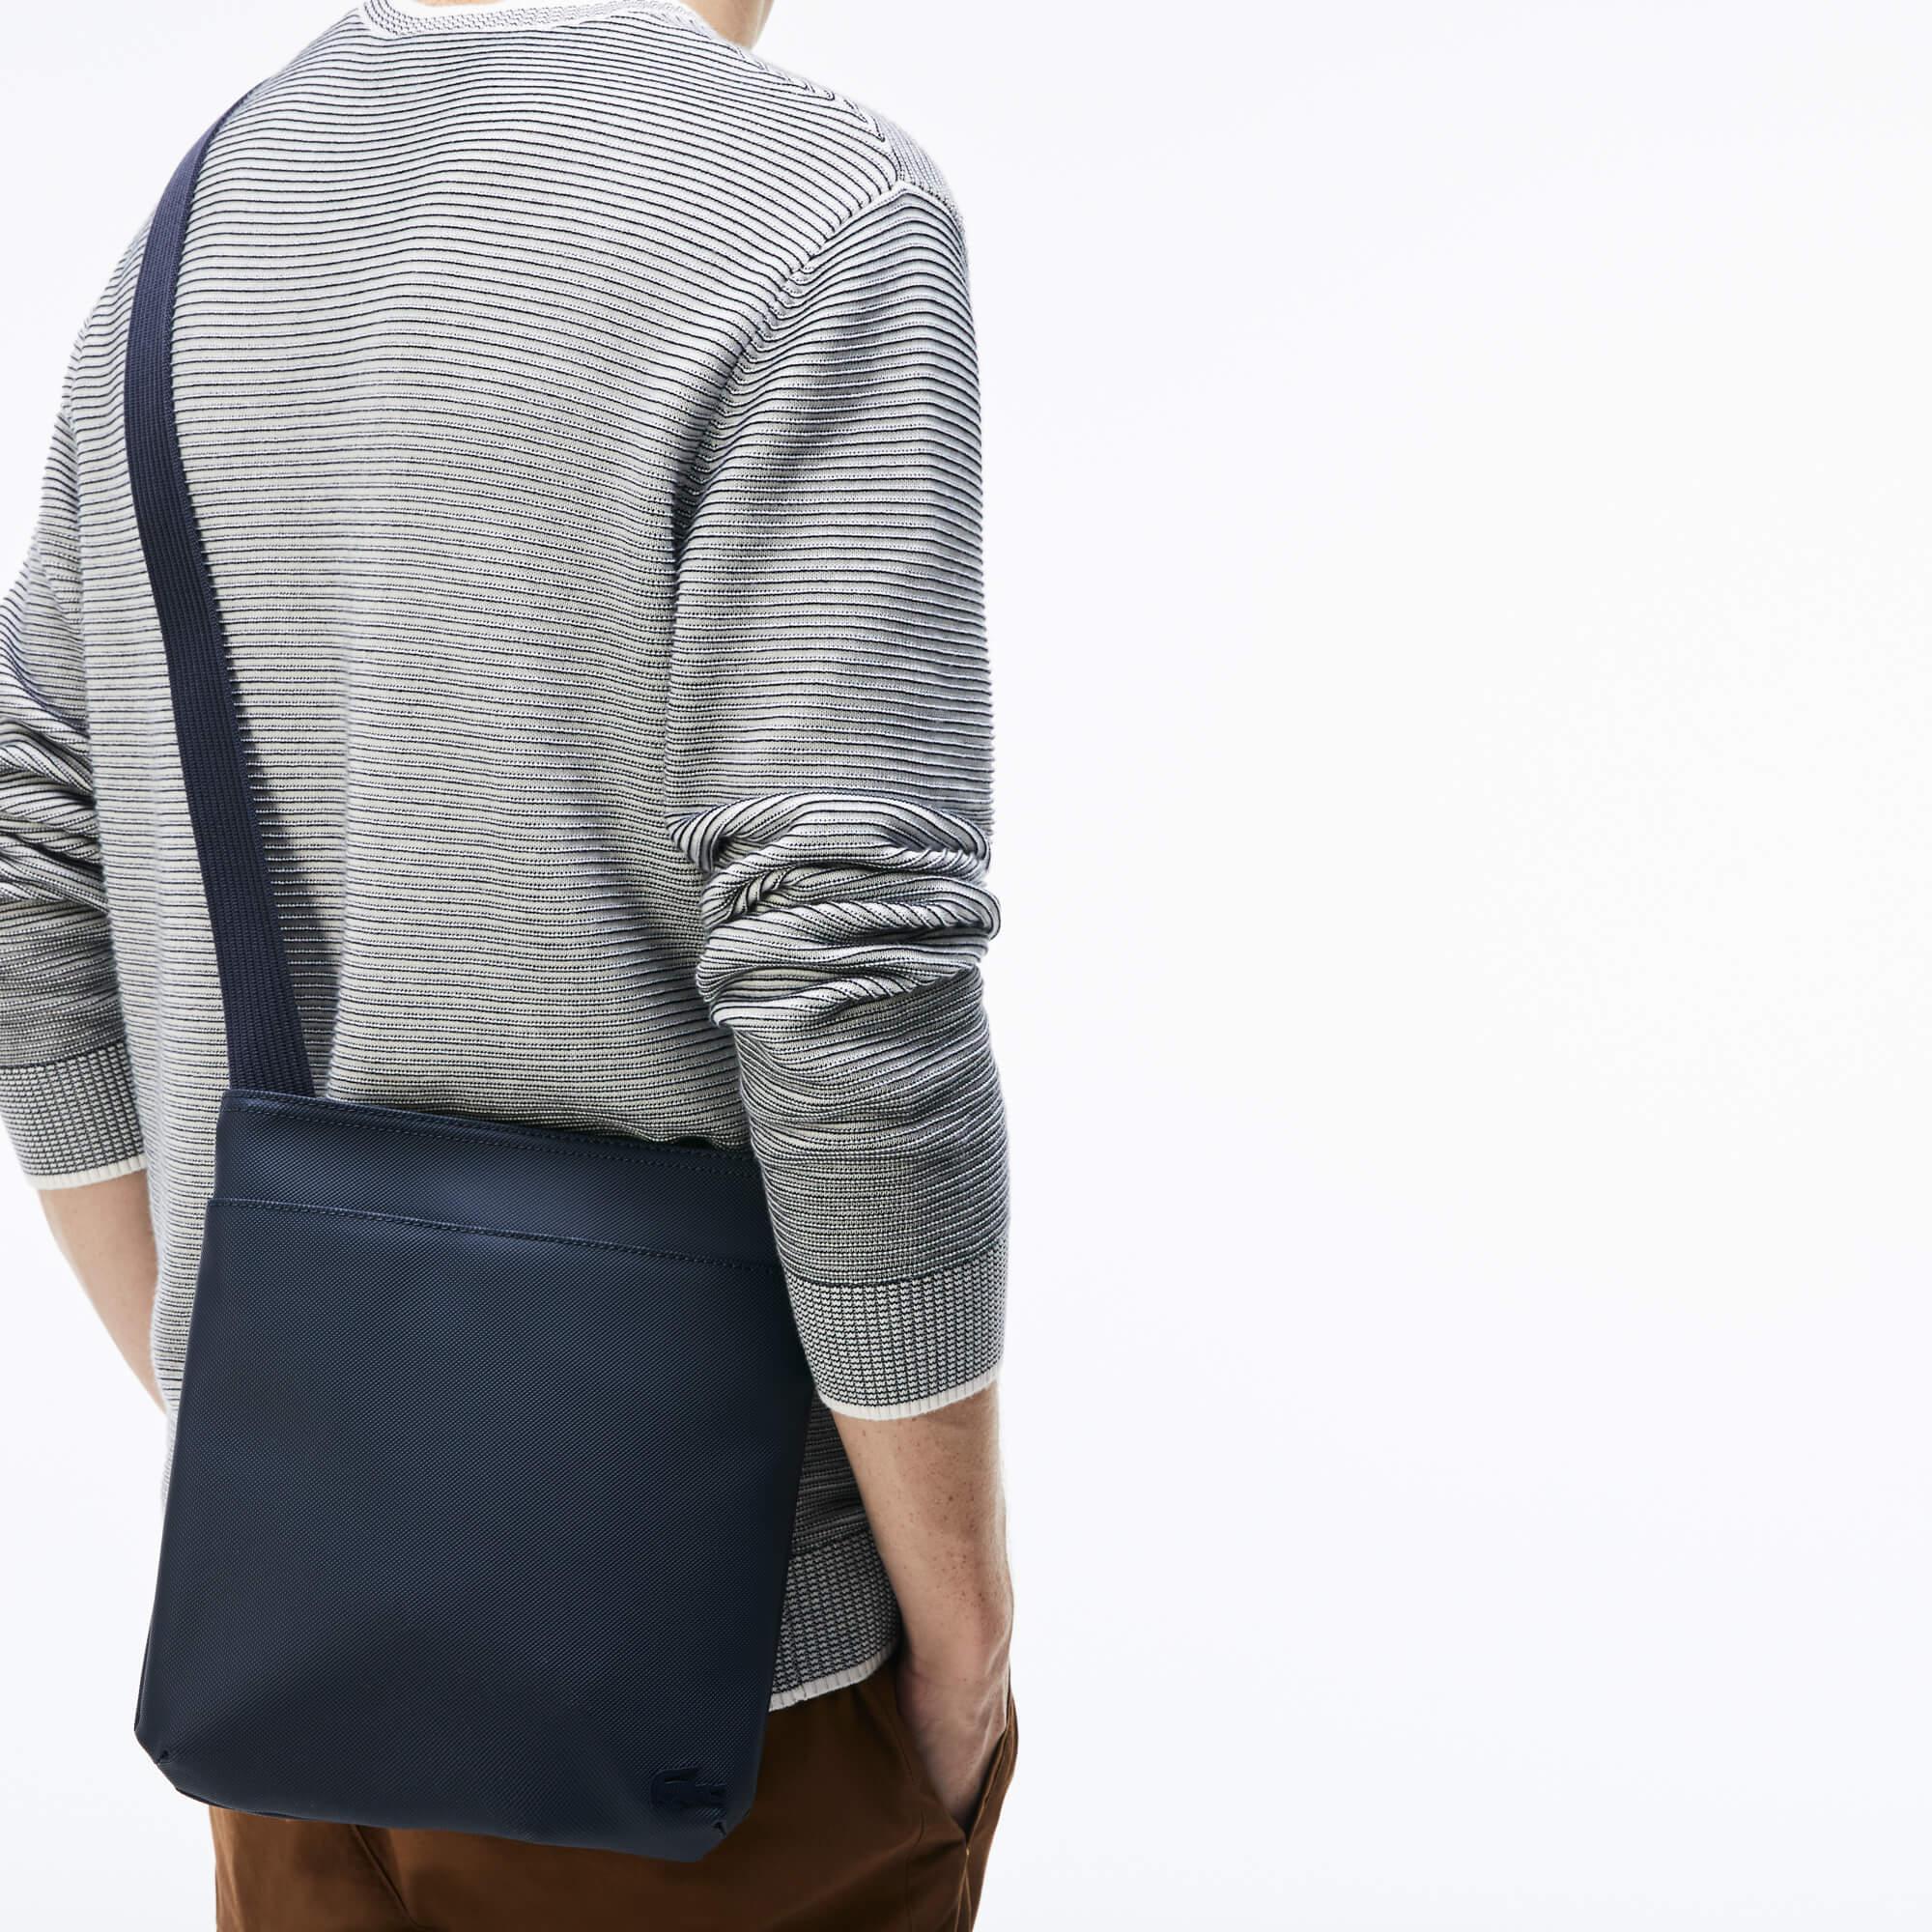 Flache Herren-Tasche CLASSIC aus Petit Piqué